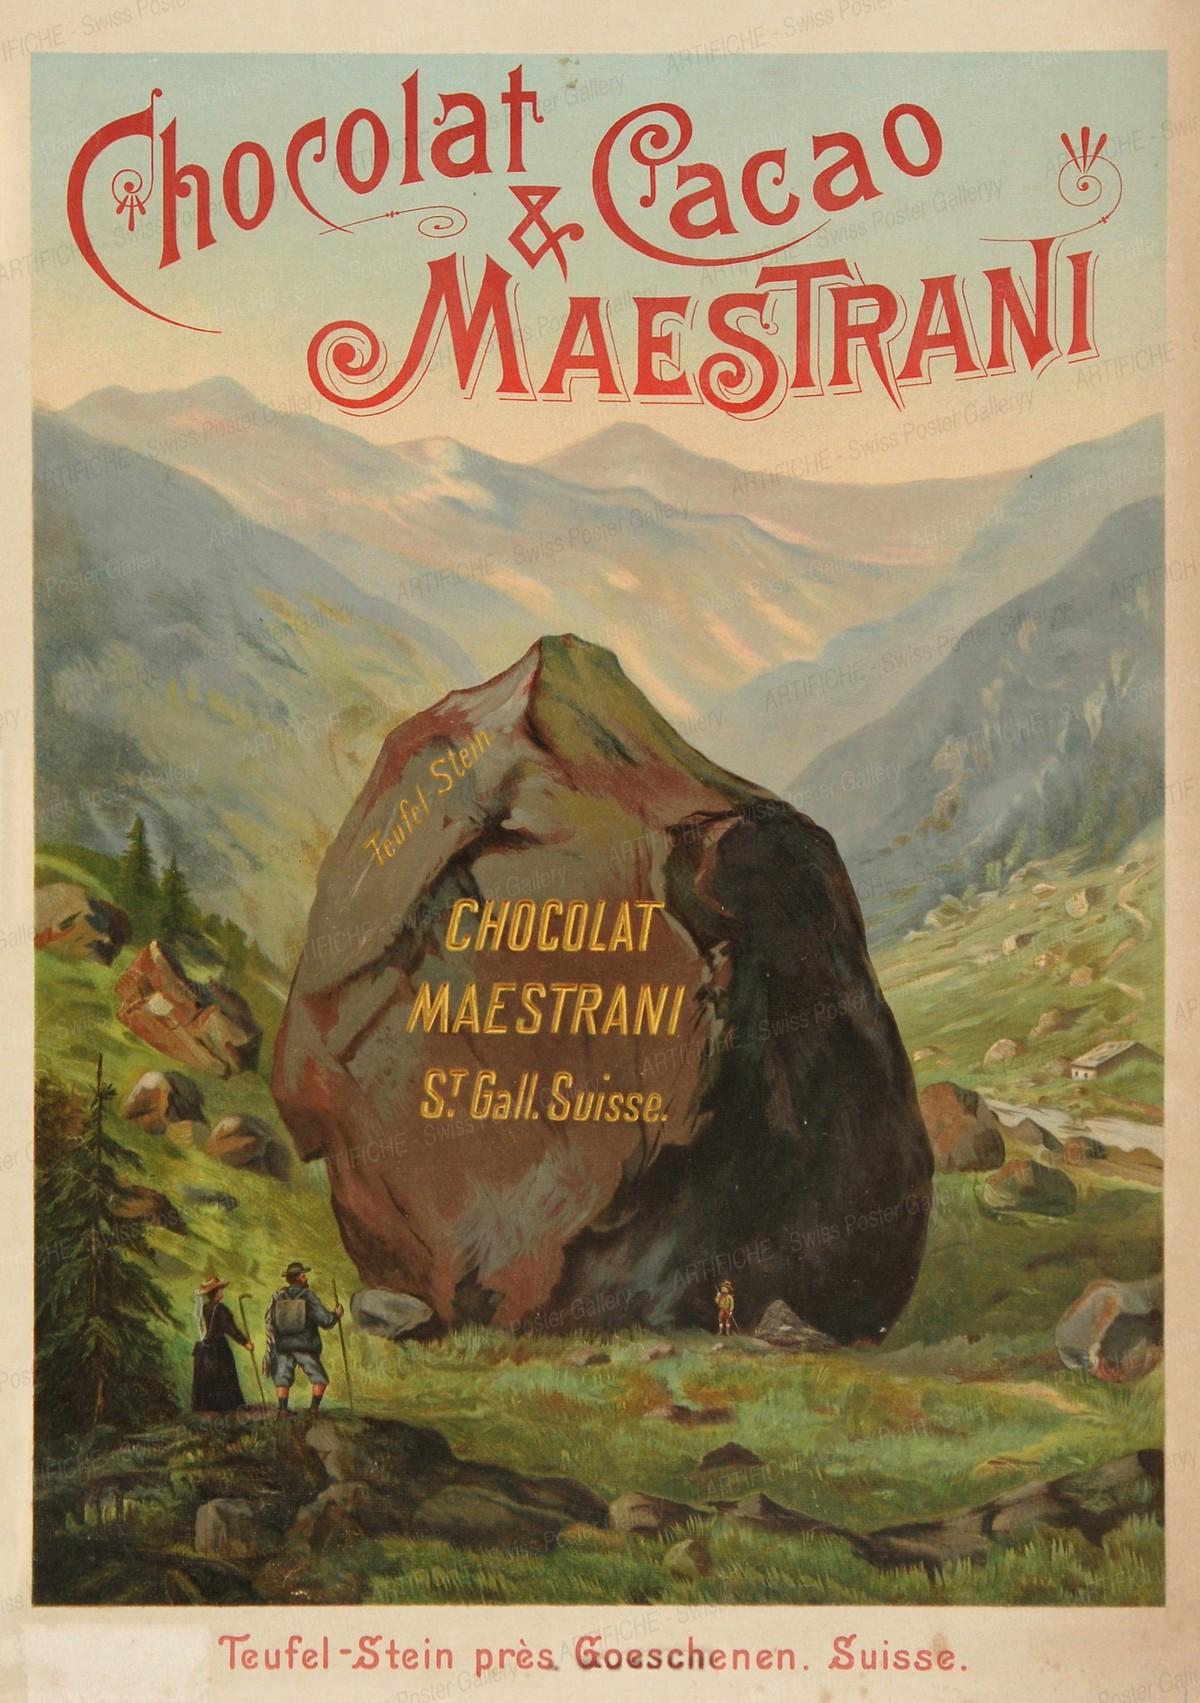 Swiss Chocolate Maestrani, Artist unknown